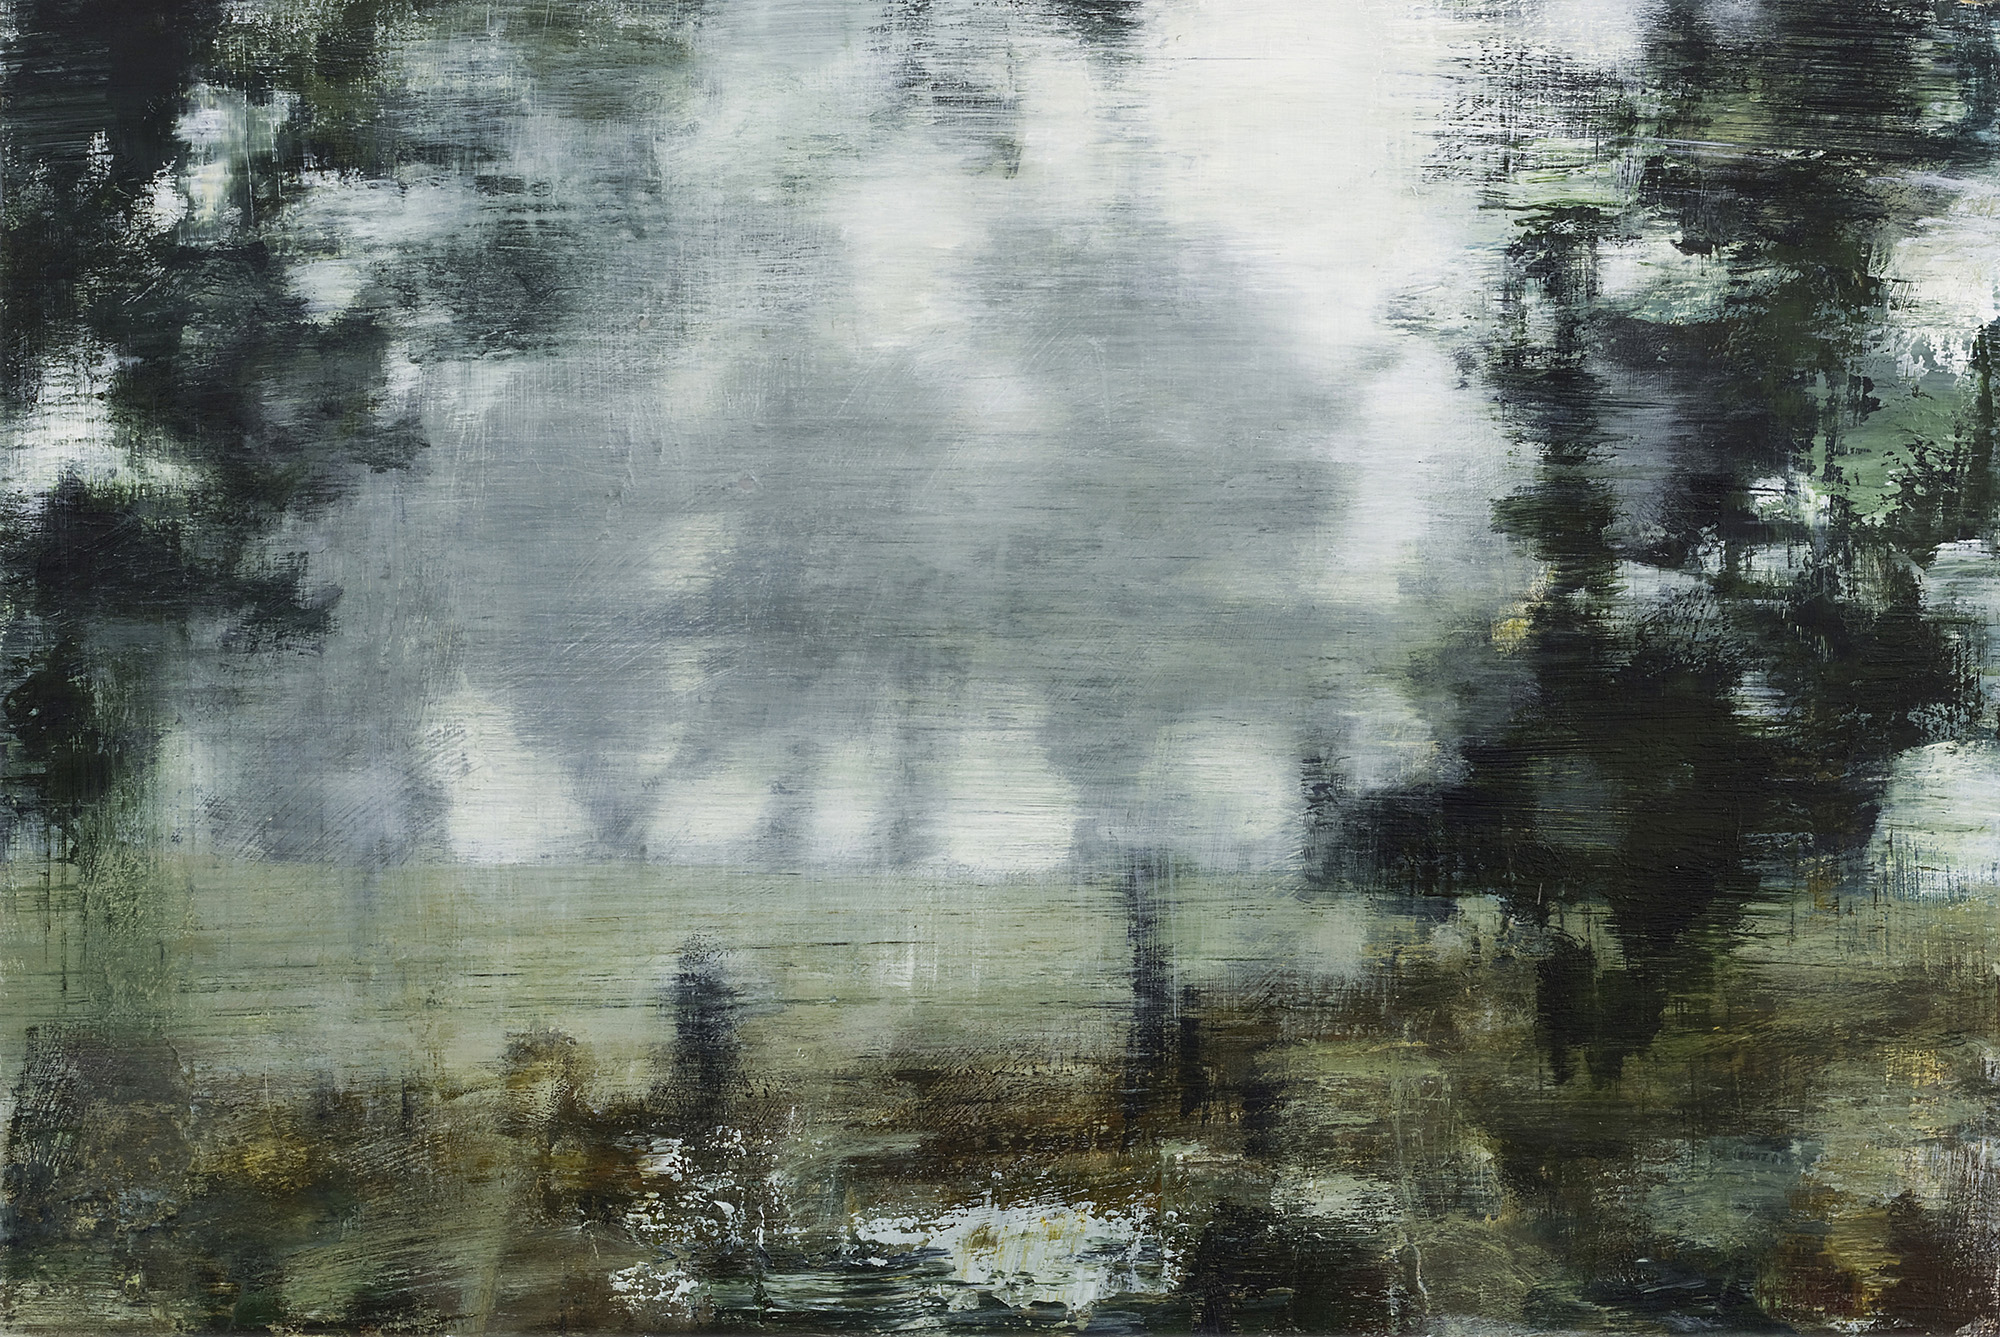 Joanna Logue, Essington - View,  2015, acrylic on board, 40 x 60